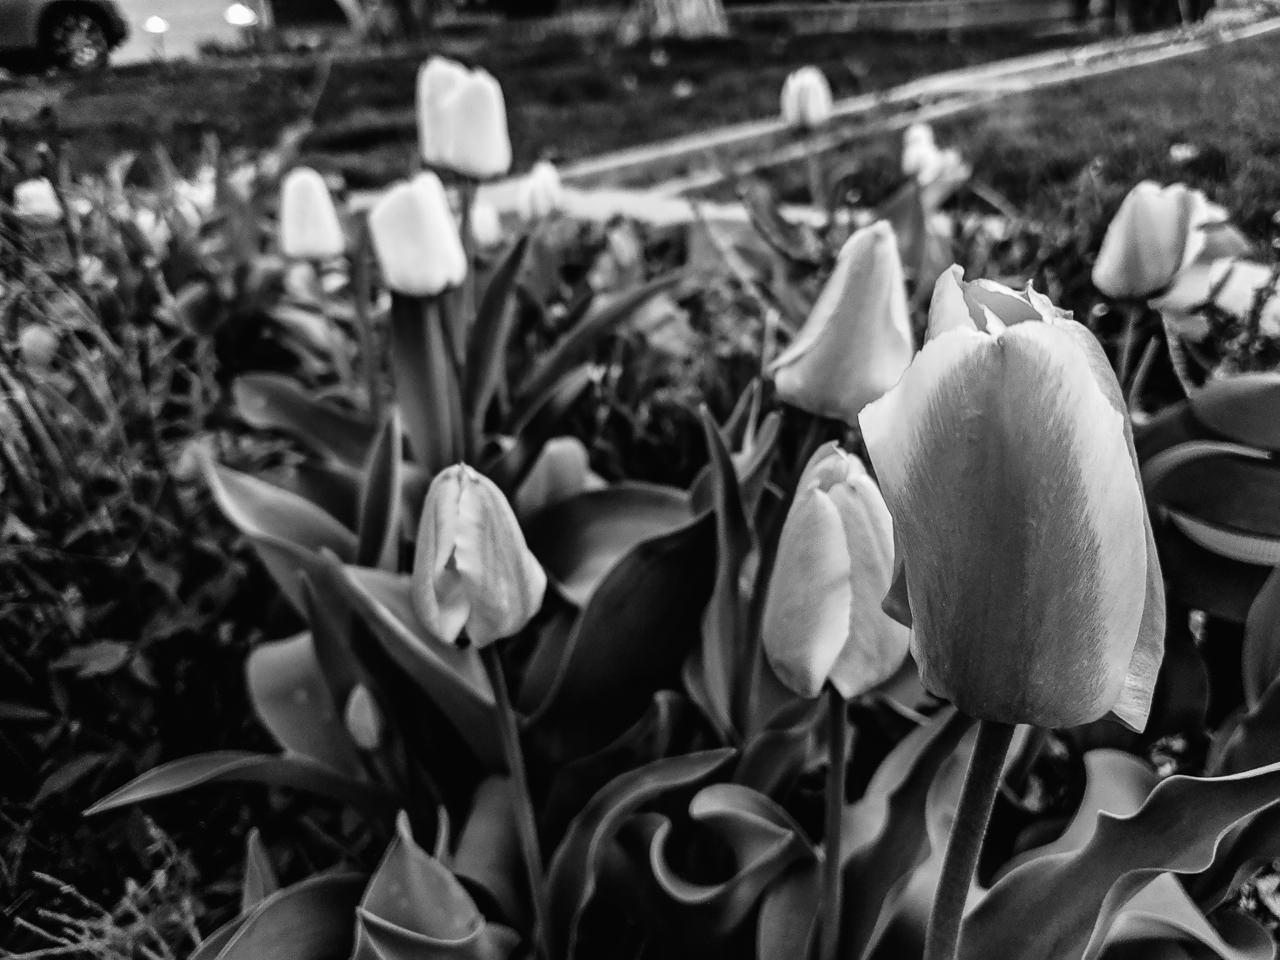 Day 117- 365 Day B&W Photo Challenge - Tulips are starting to bloom - Google Pixel 3, VSCO Fuji Neopan 400 Film Simulation